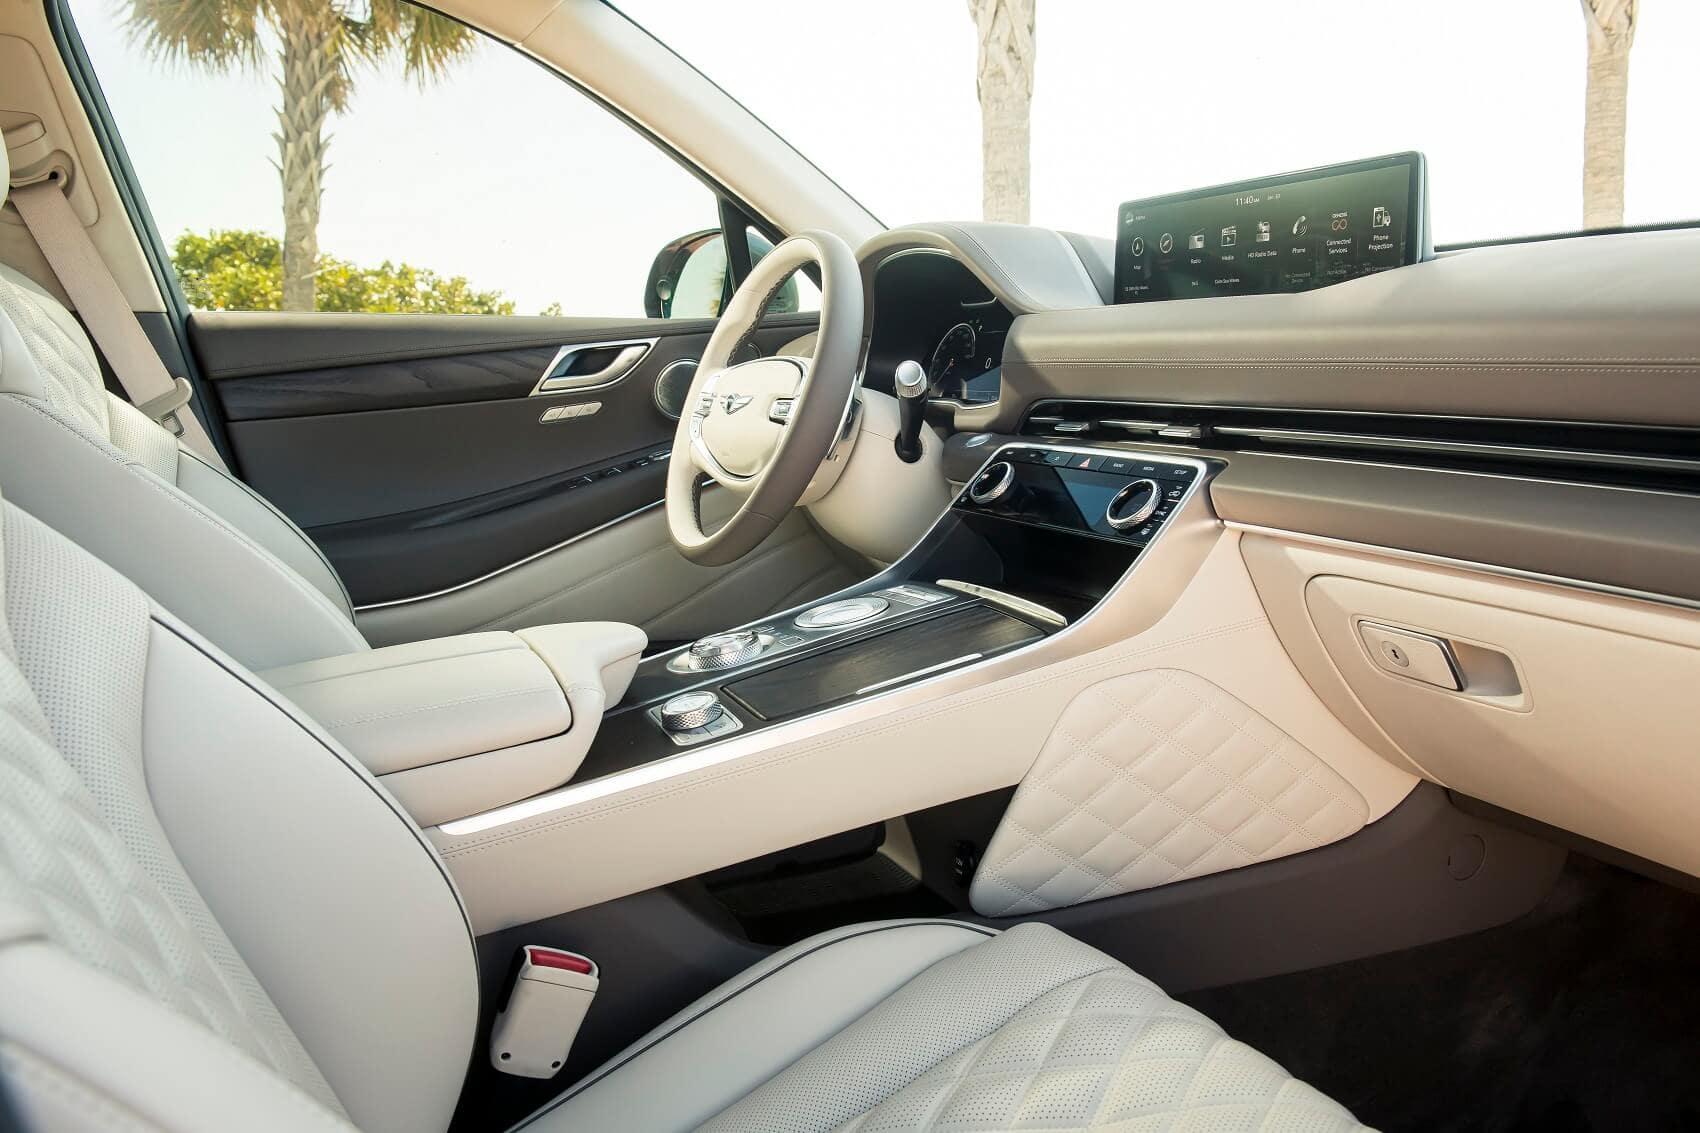 The Genesis GV80 Interior: Convenience Features